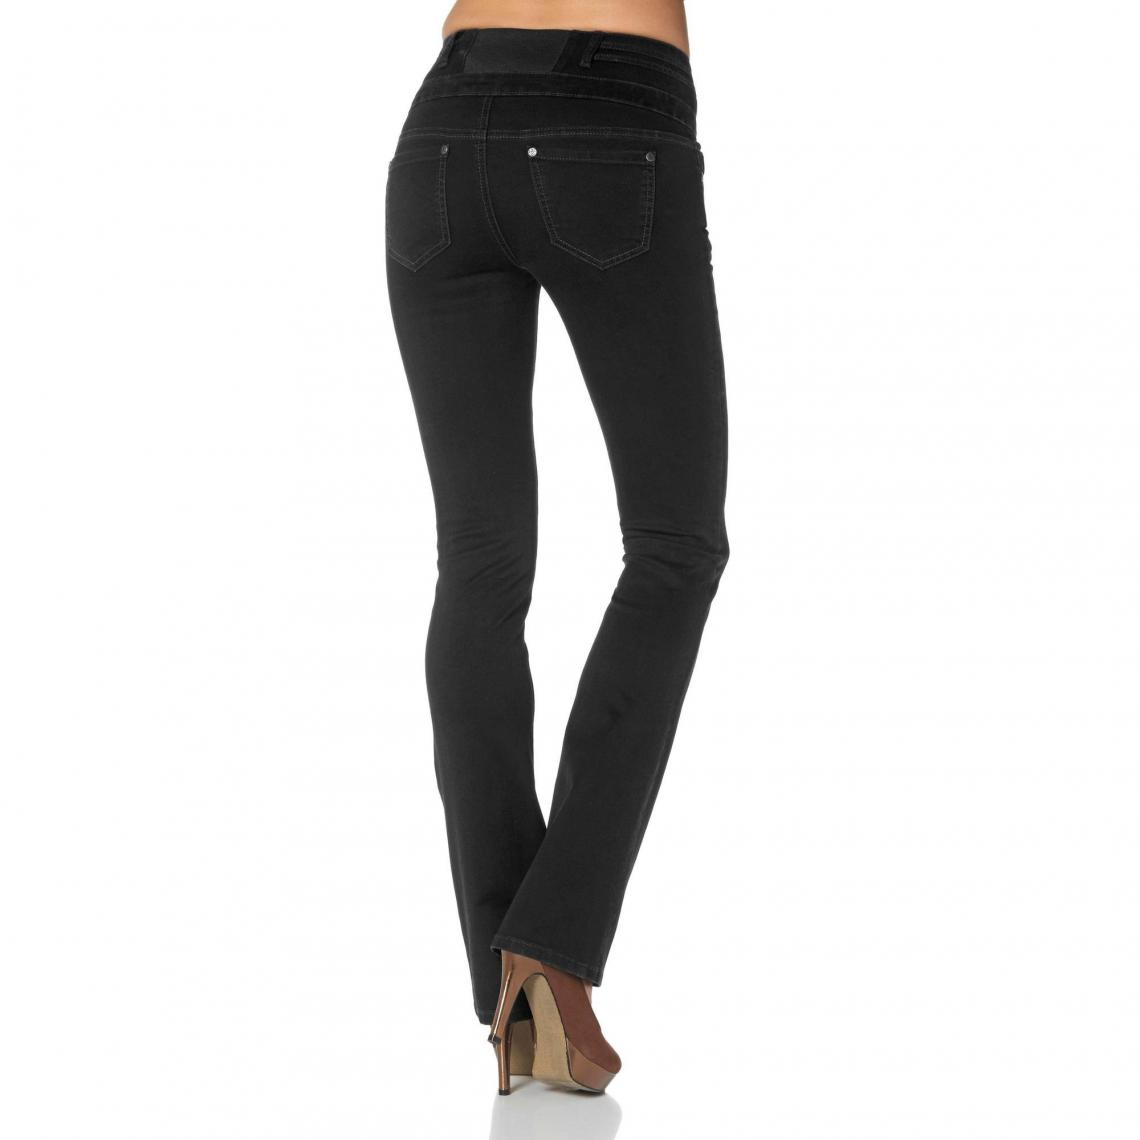 2fdc121d8f352 Jean bootcut taille haute stretch femme Arizona - Noir Arizona Femme